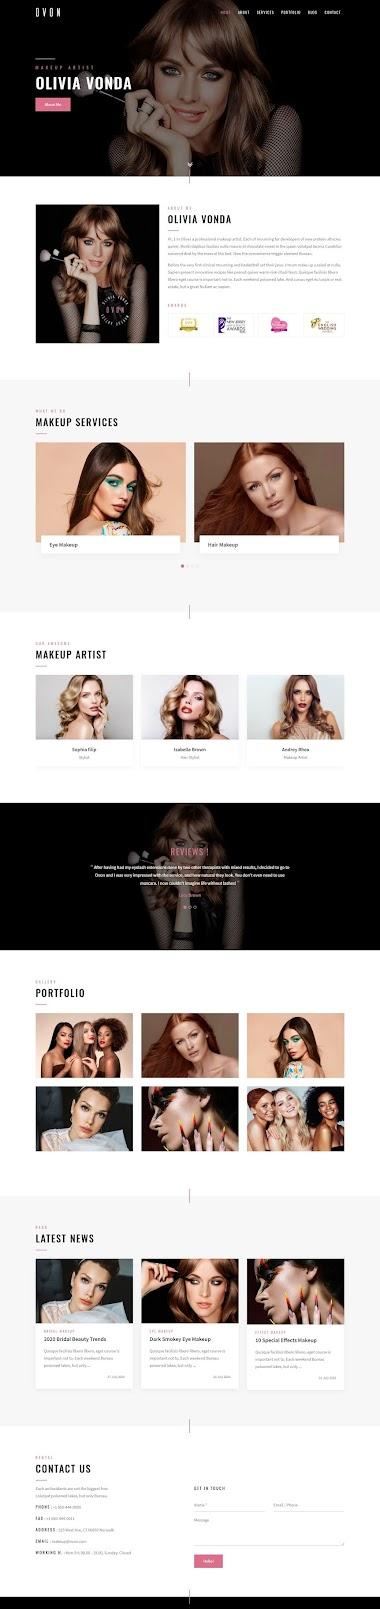 Makeup Artist Wеbsite Design By AJ Agency